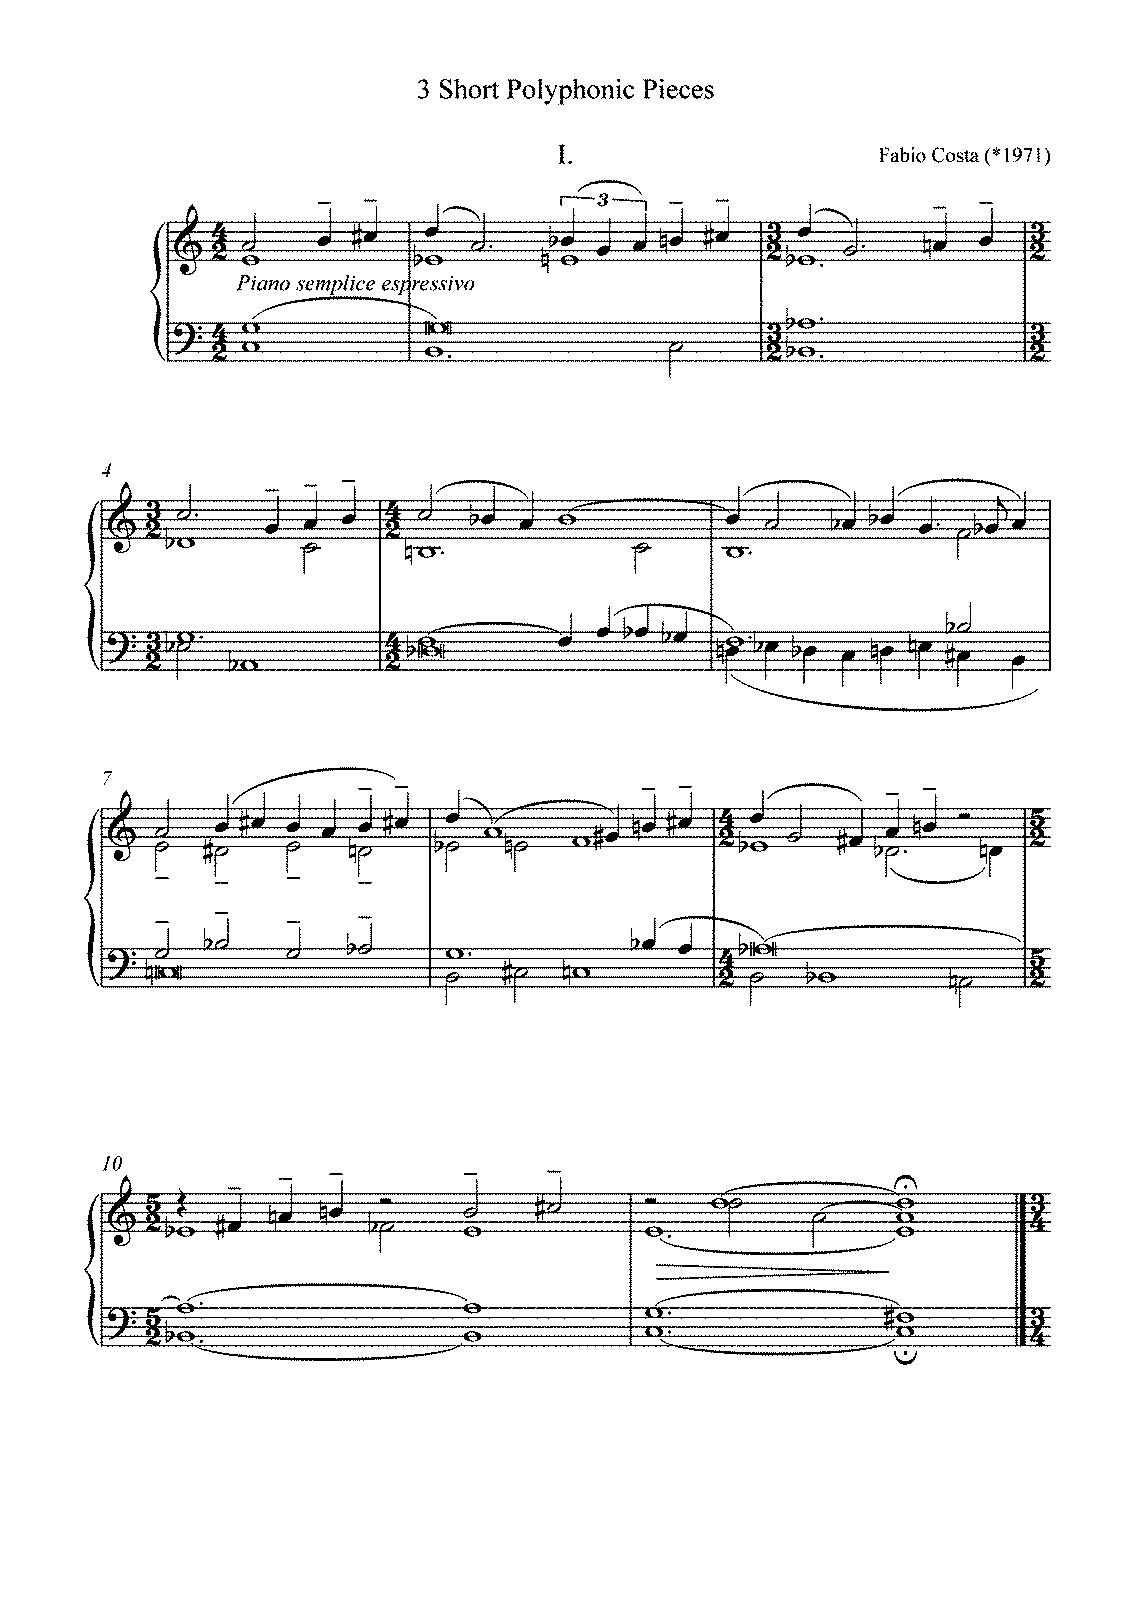 3 Short Polyphonic Pieces (Costa, Fabio) - IMSLP/Petrucci